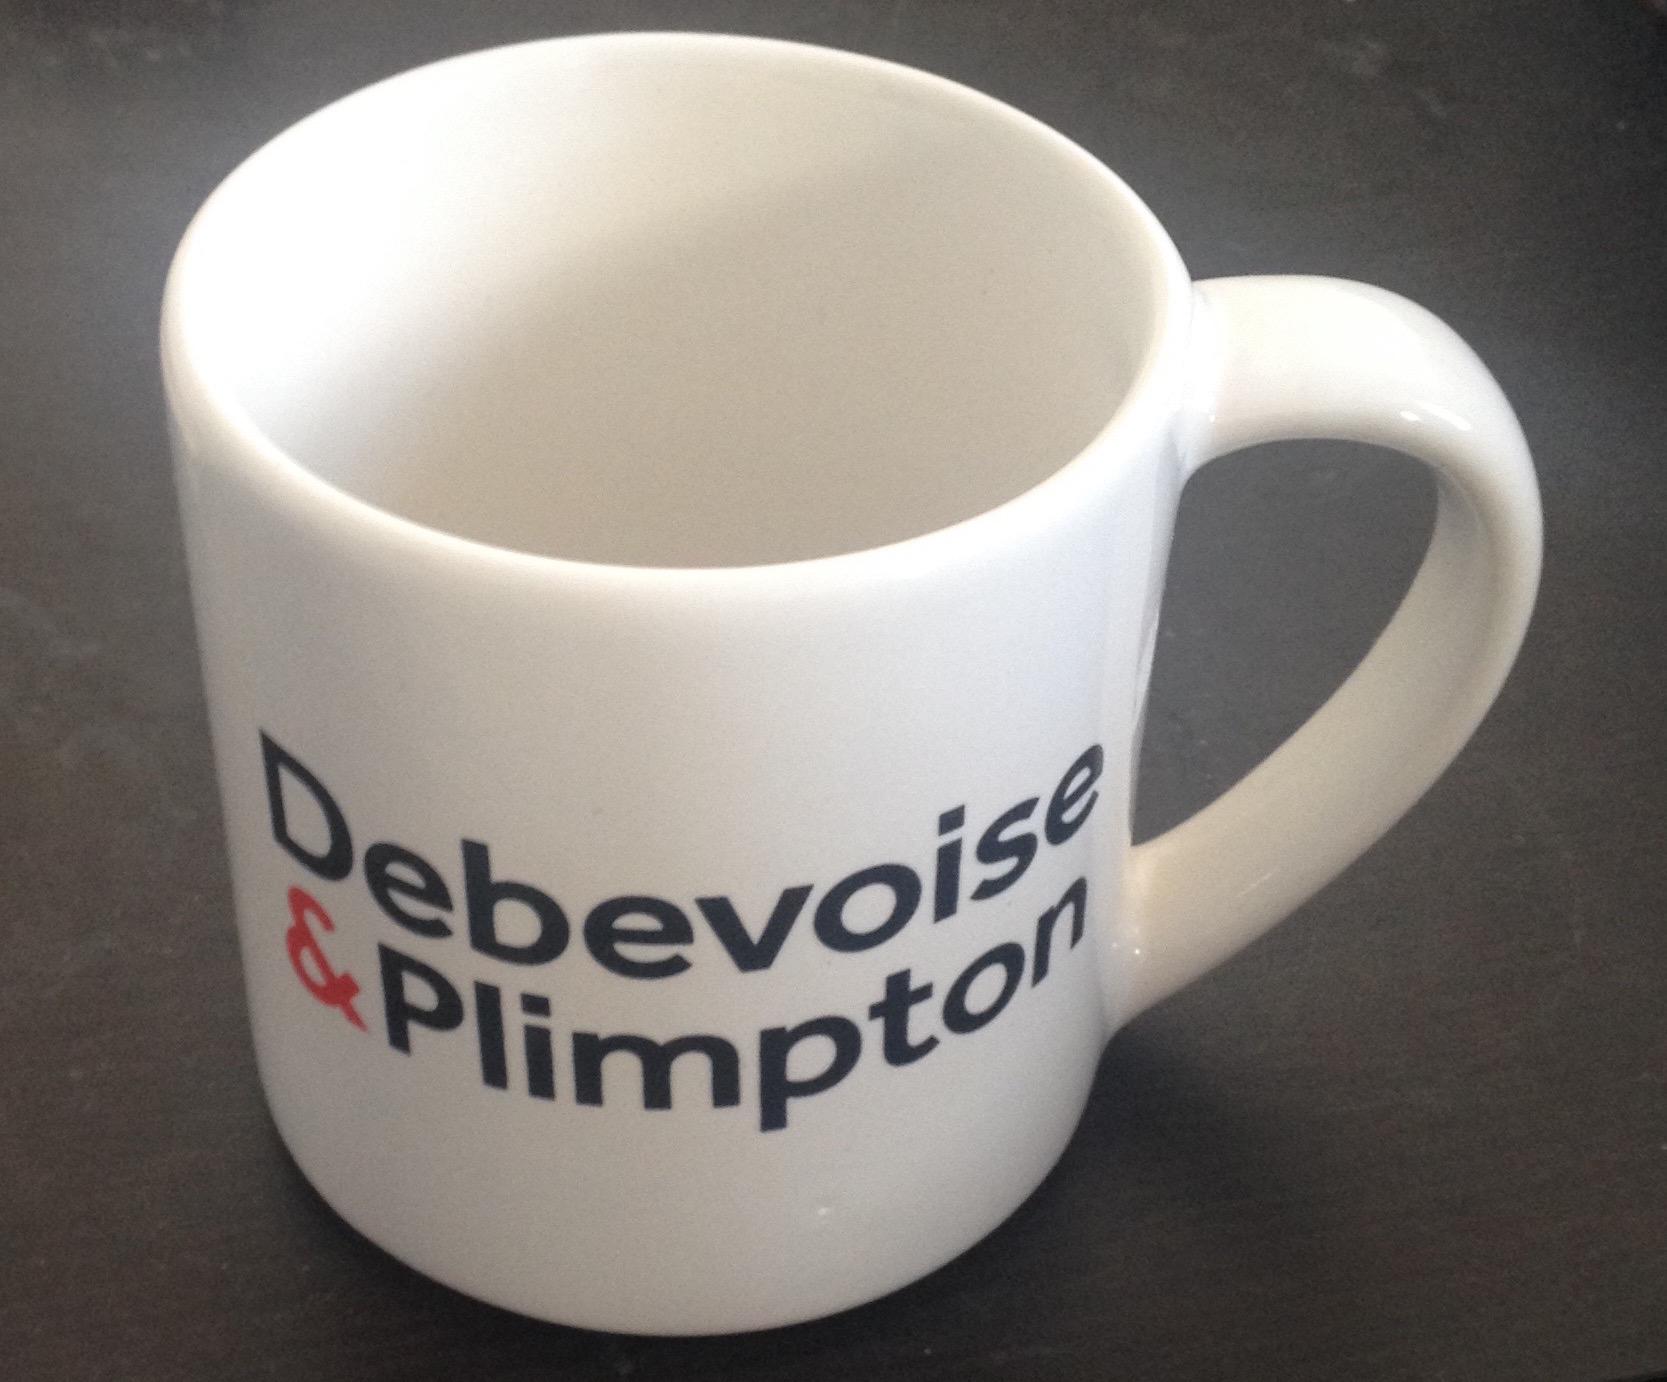 Debevoise big mug